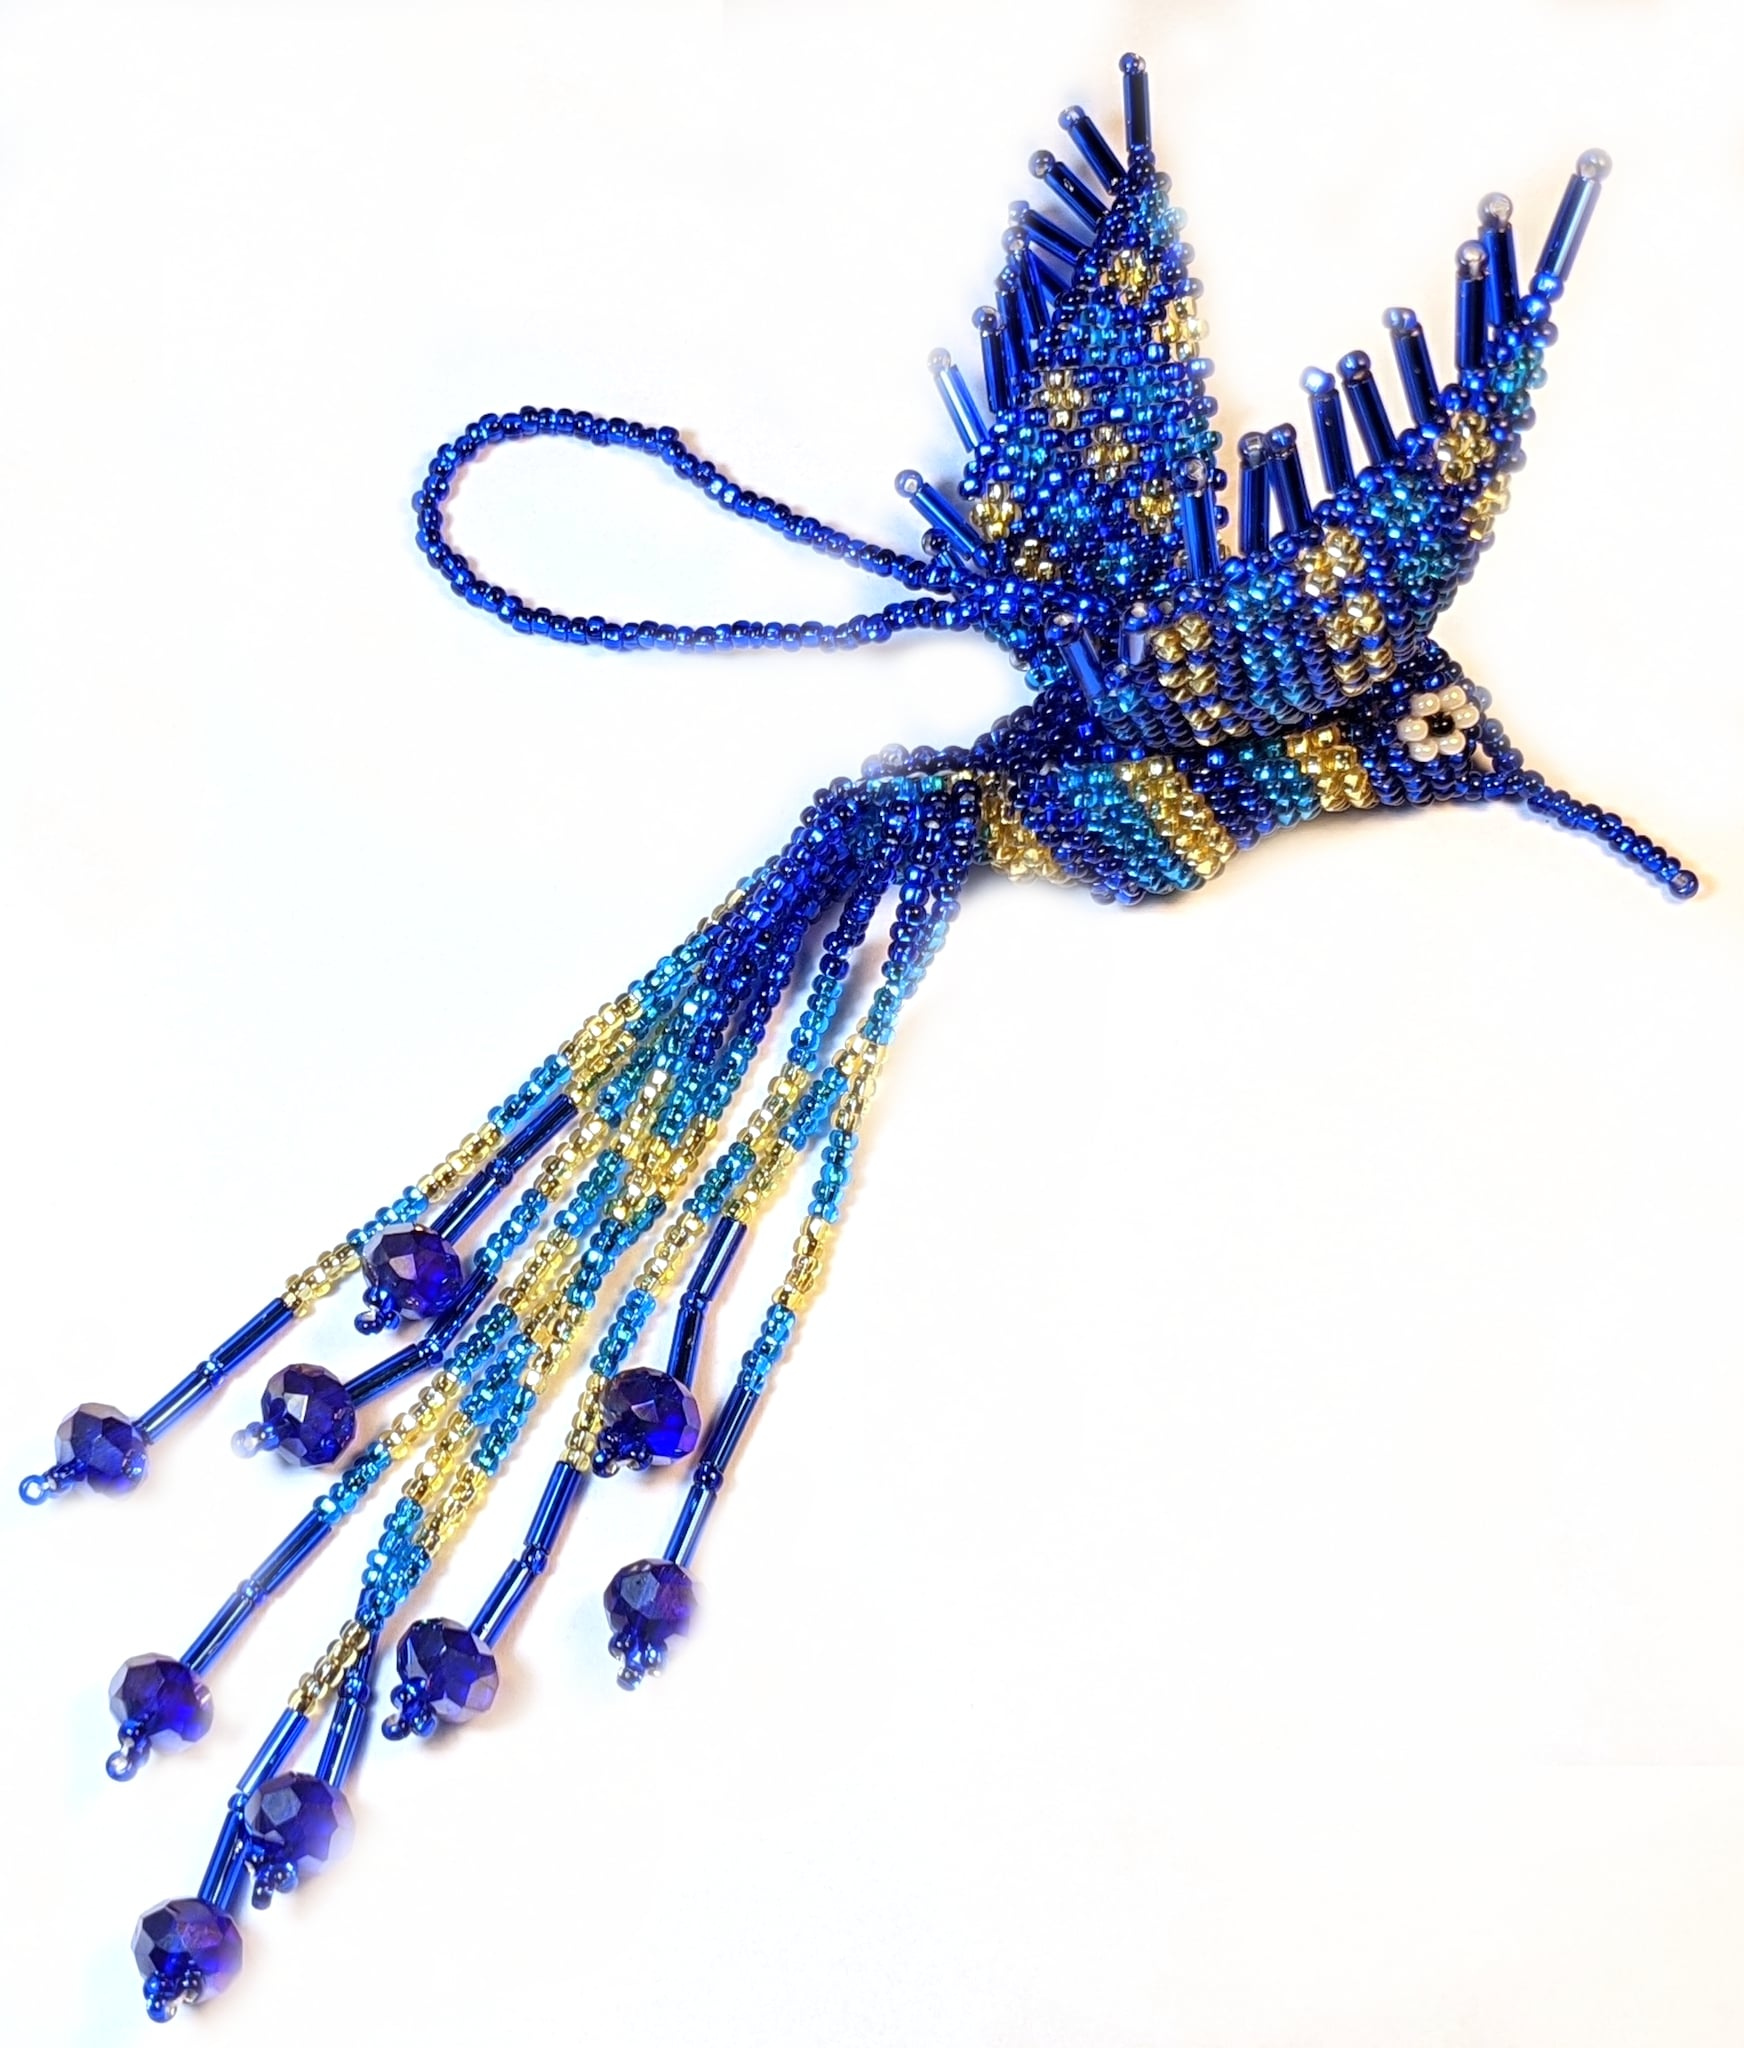 Hummingbird Beaded Ornament - Sapphire Blue, Celestial Blue, and Light Gold